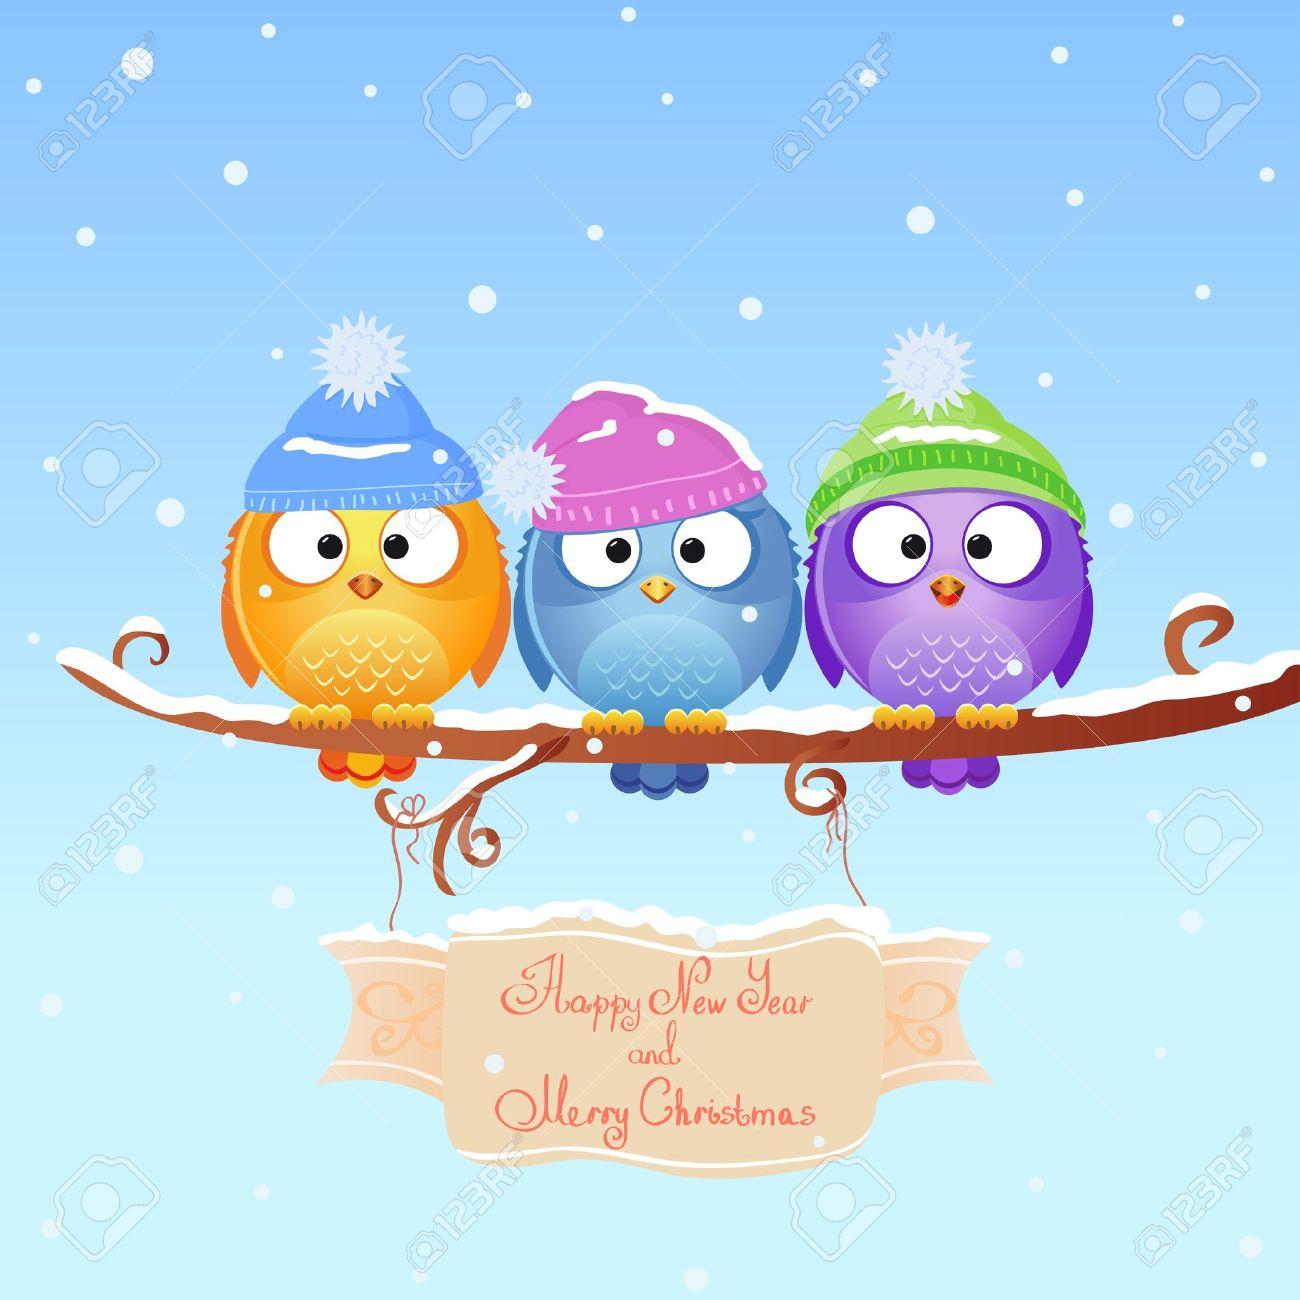 Christmas Bird.Christmas Bird